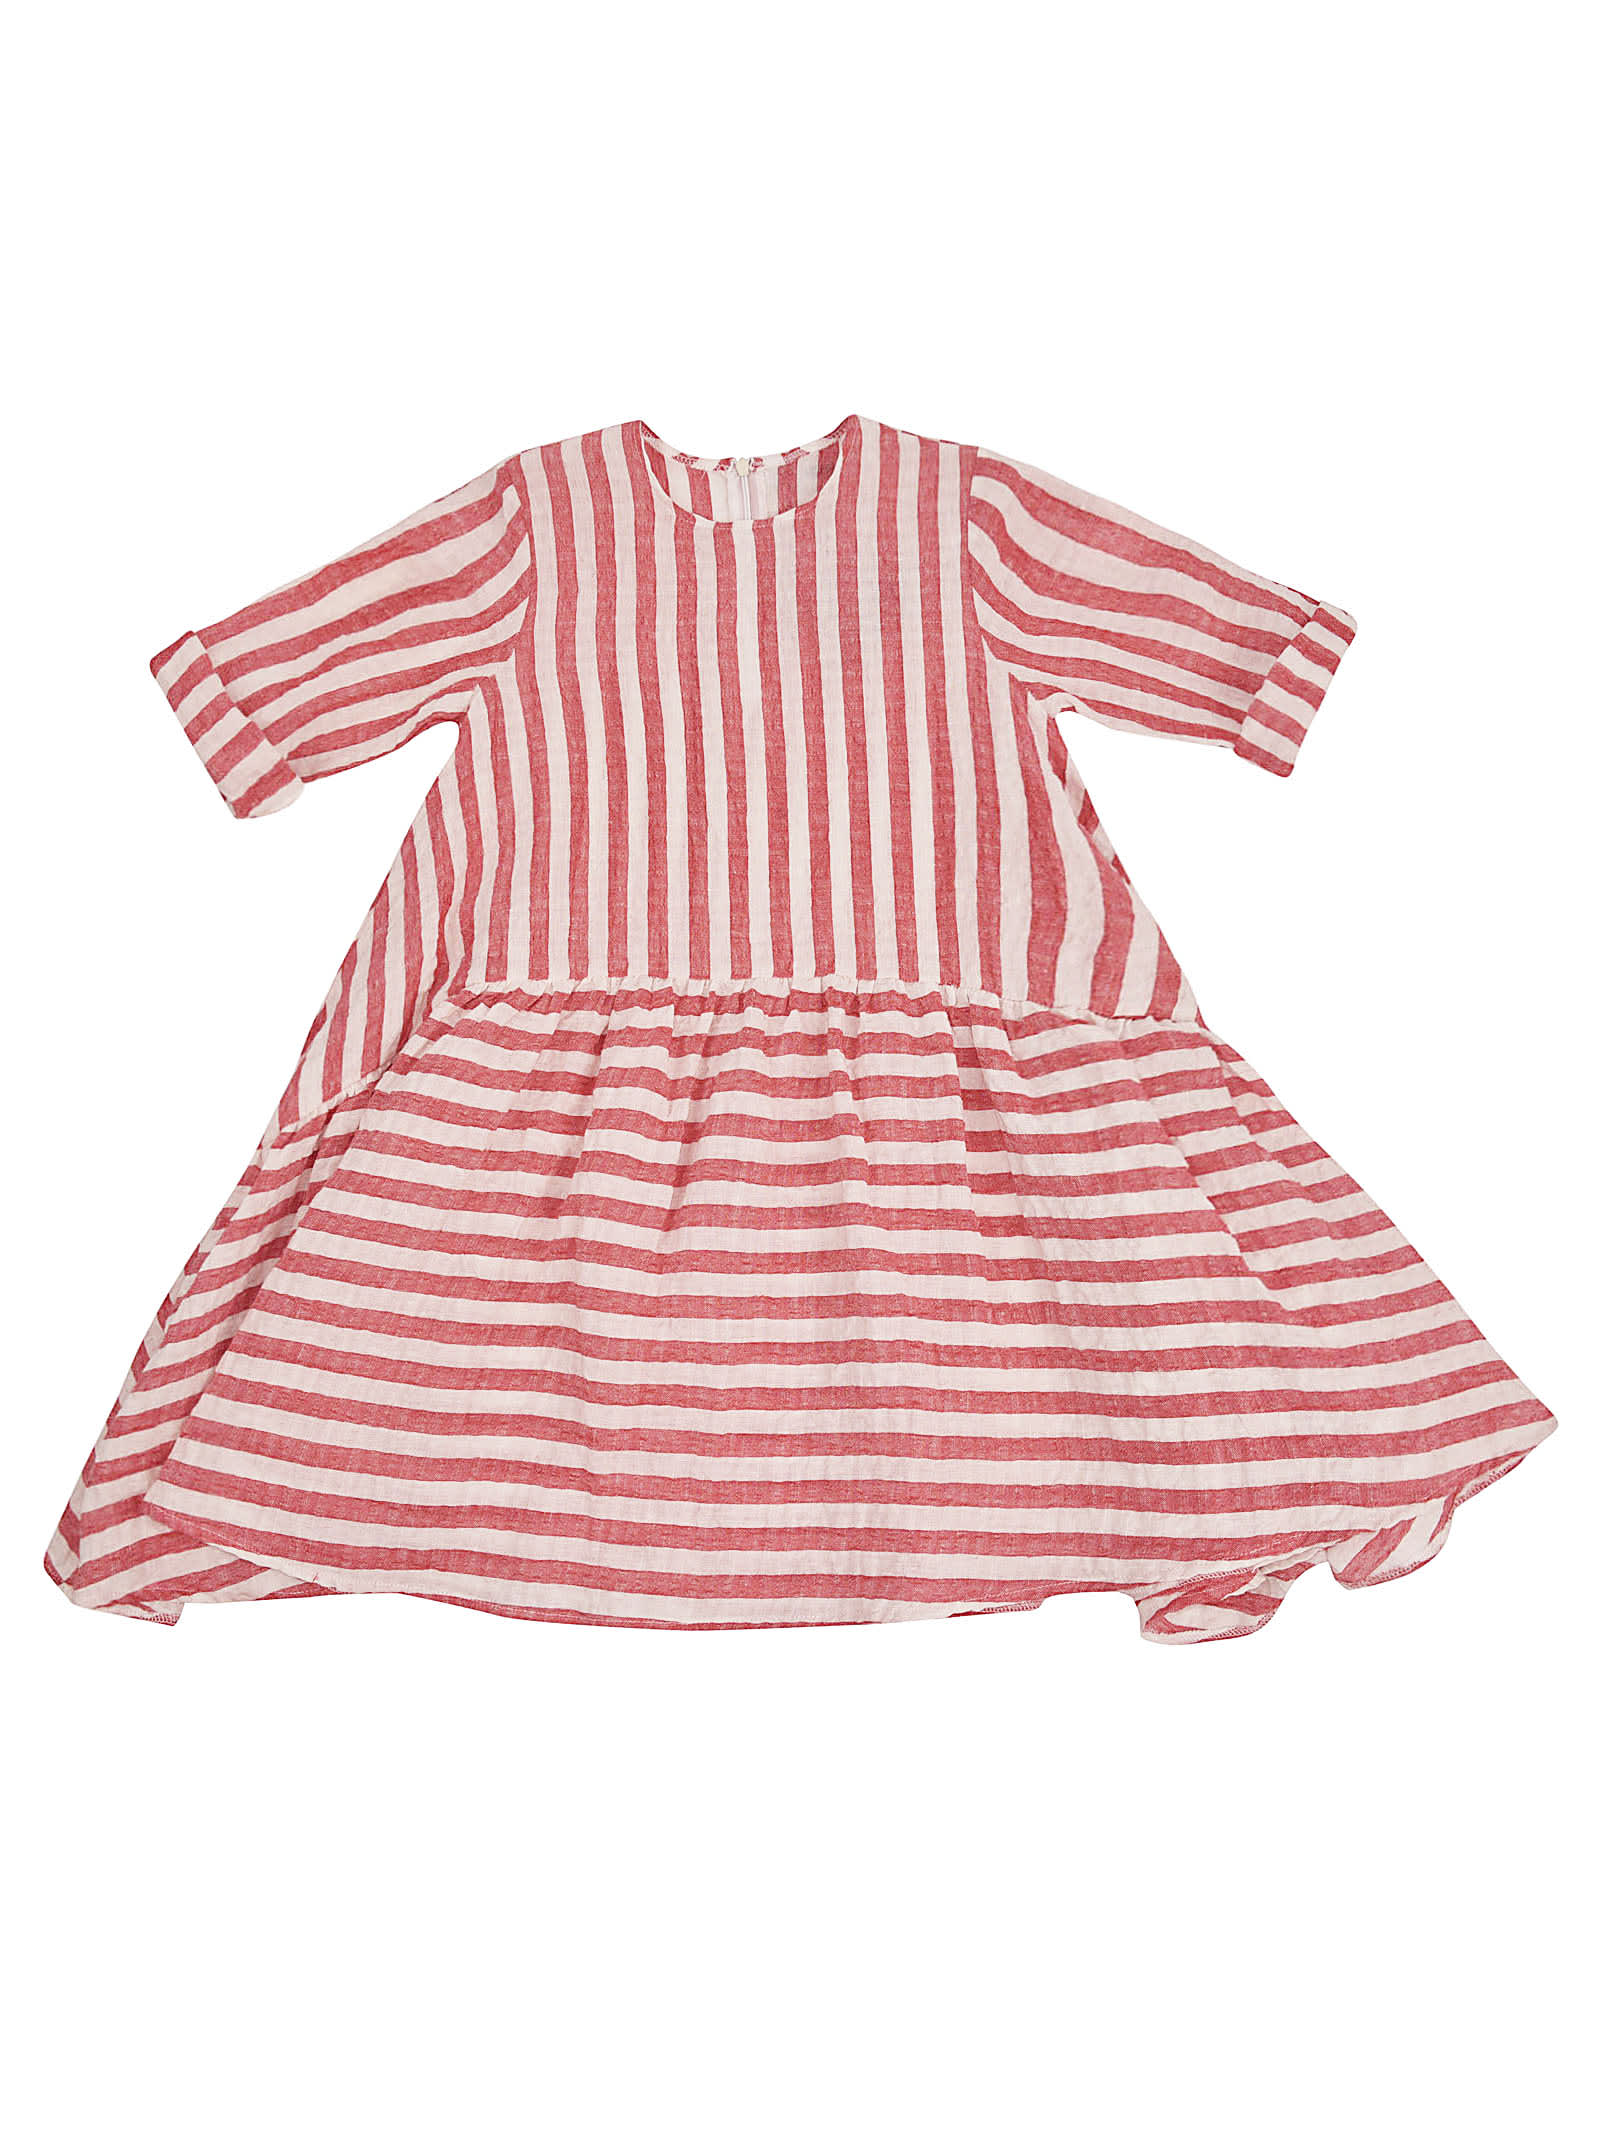 Buy Cucù Lab Striped Dress online, shop Cucù Lab with free shipping